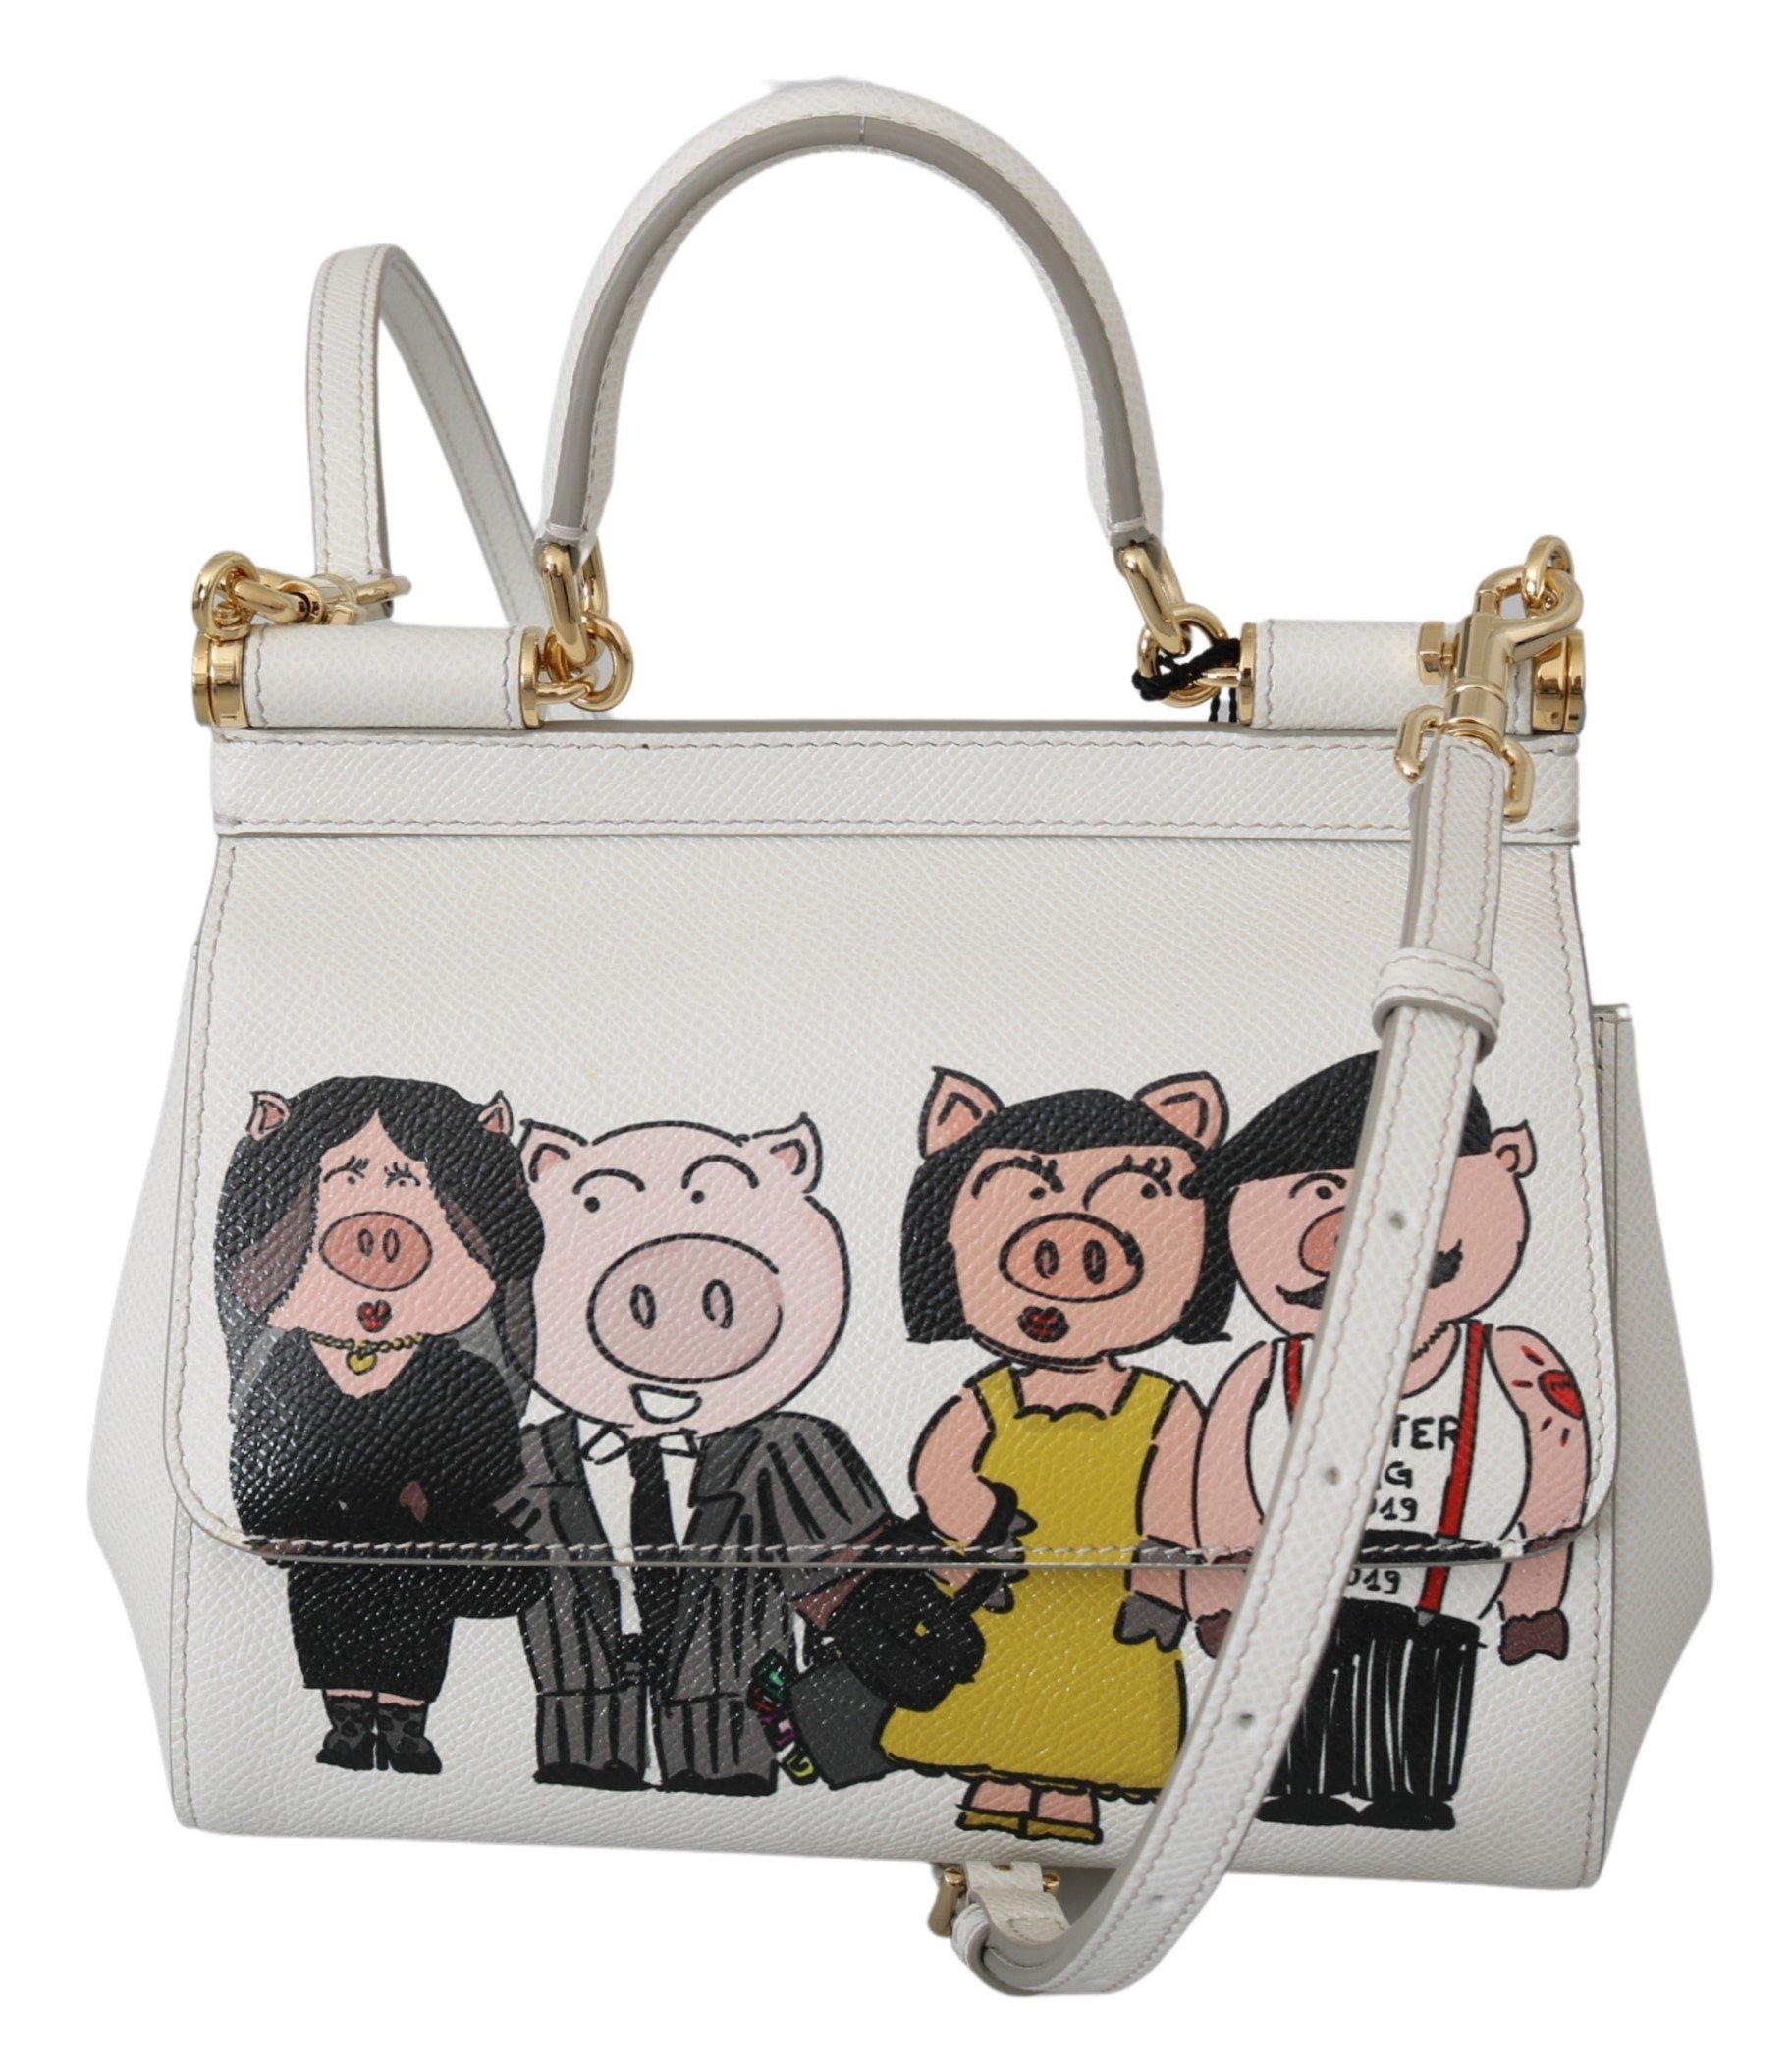 Dolce & Gabbana Women's Leather Shoulder Bag White VAS10075